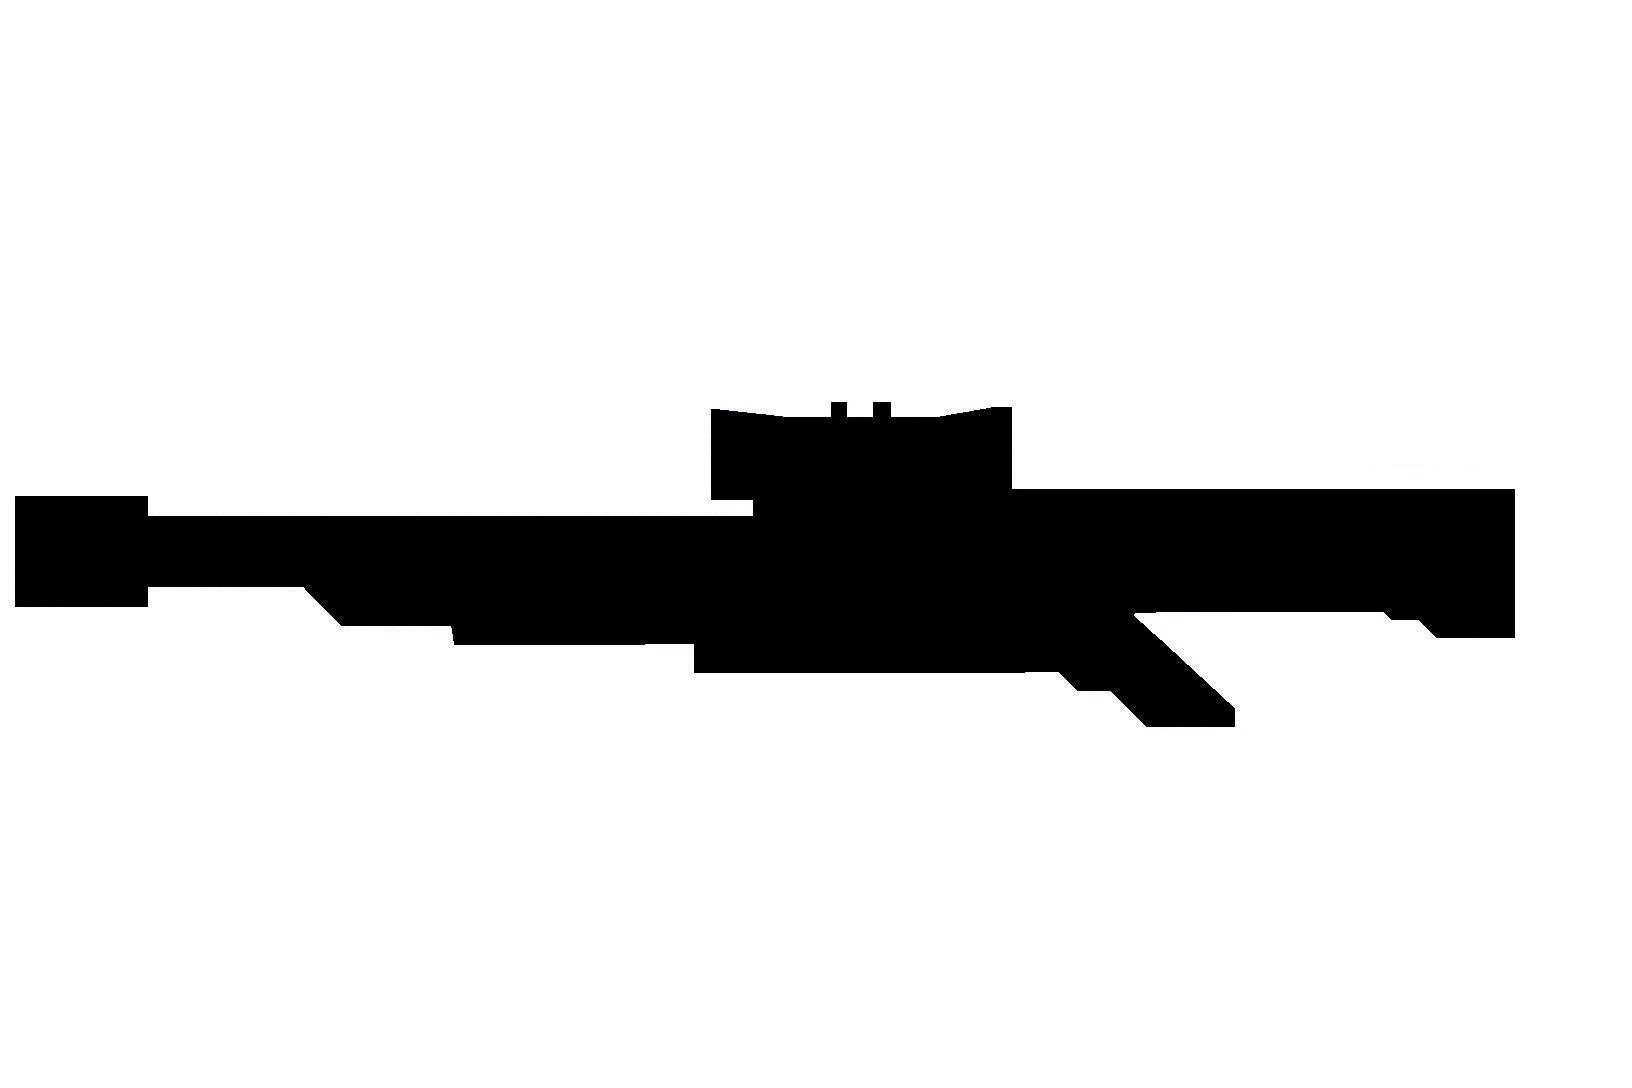 mepain's loser rifle